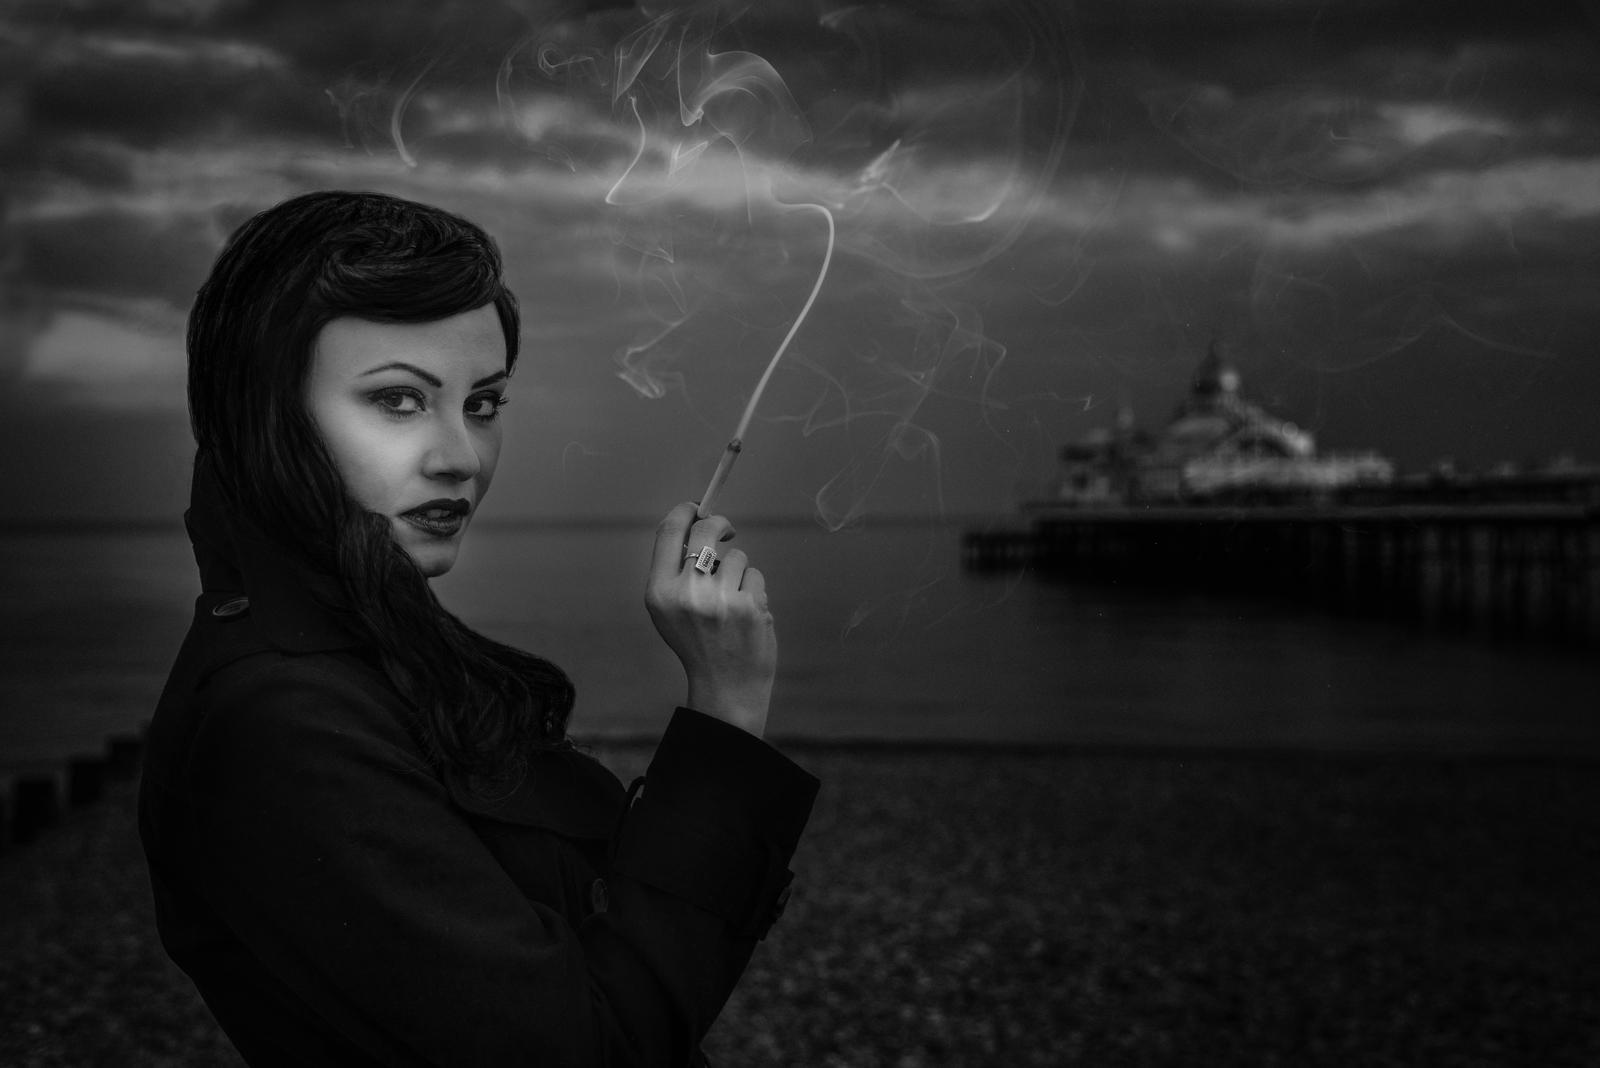 Film Noir Smoking at the Pier